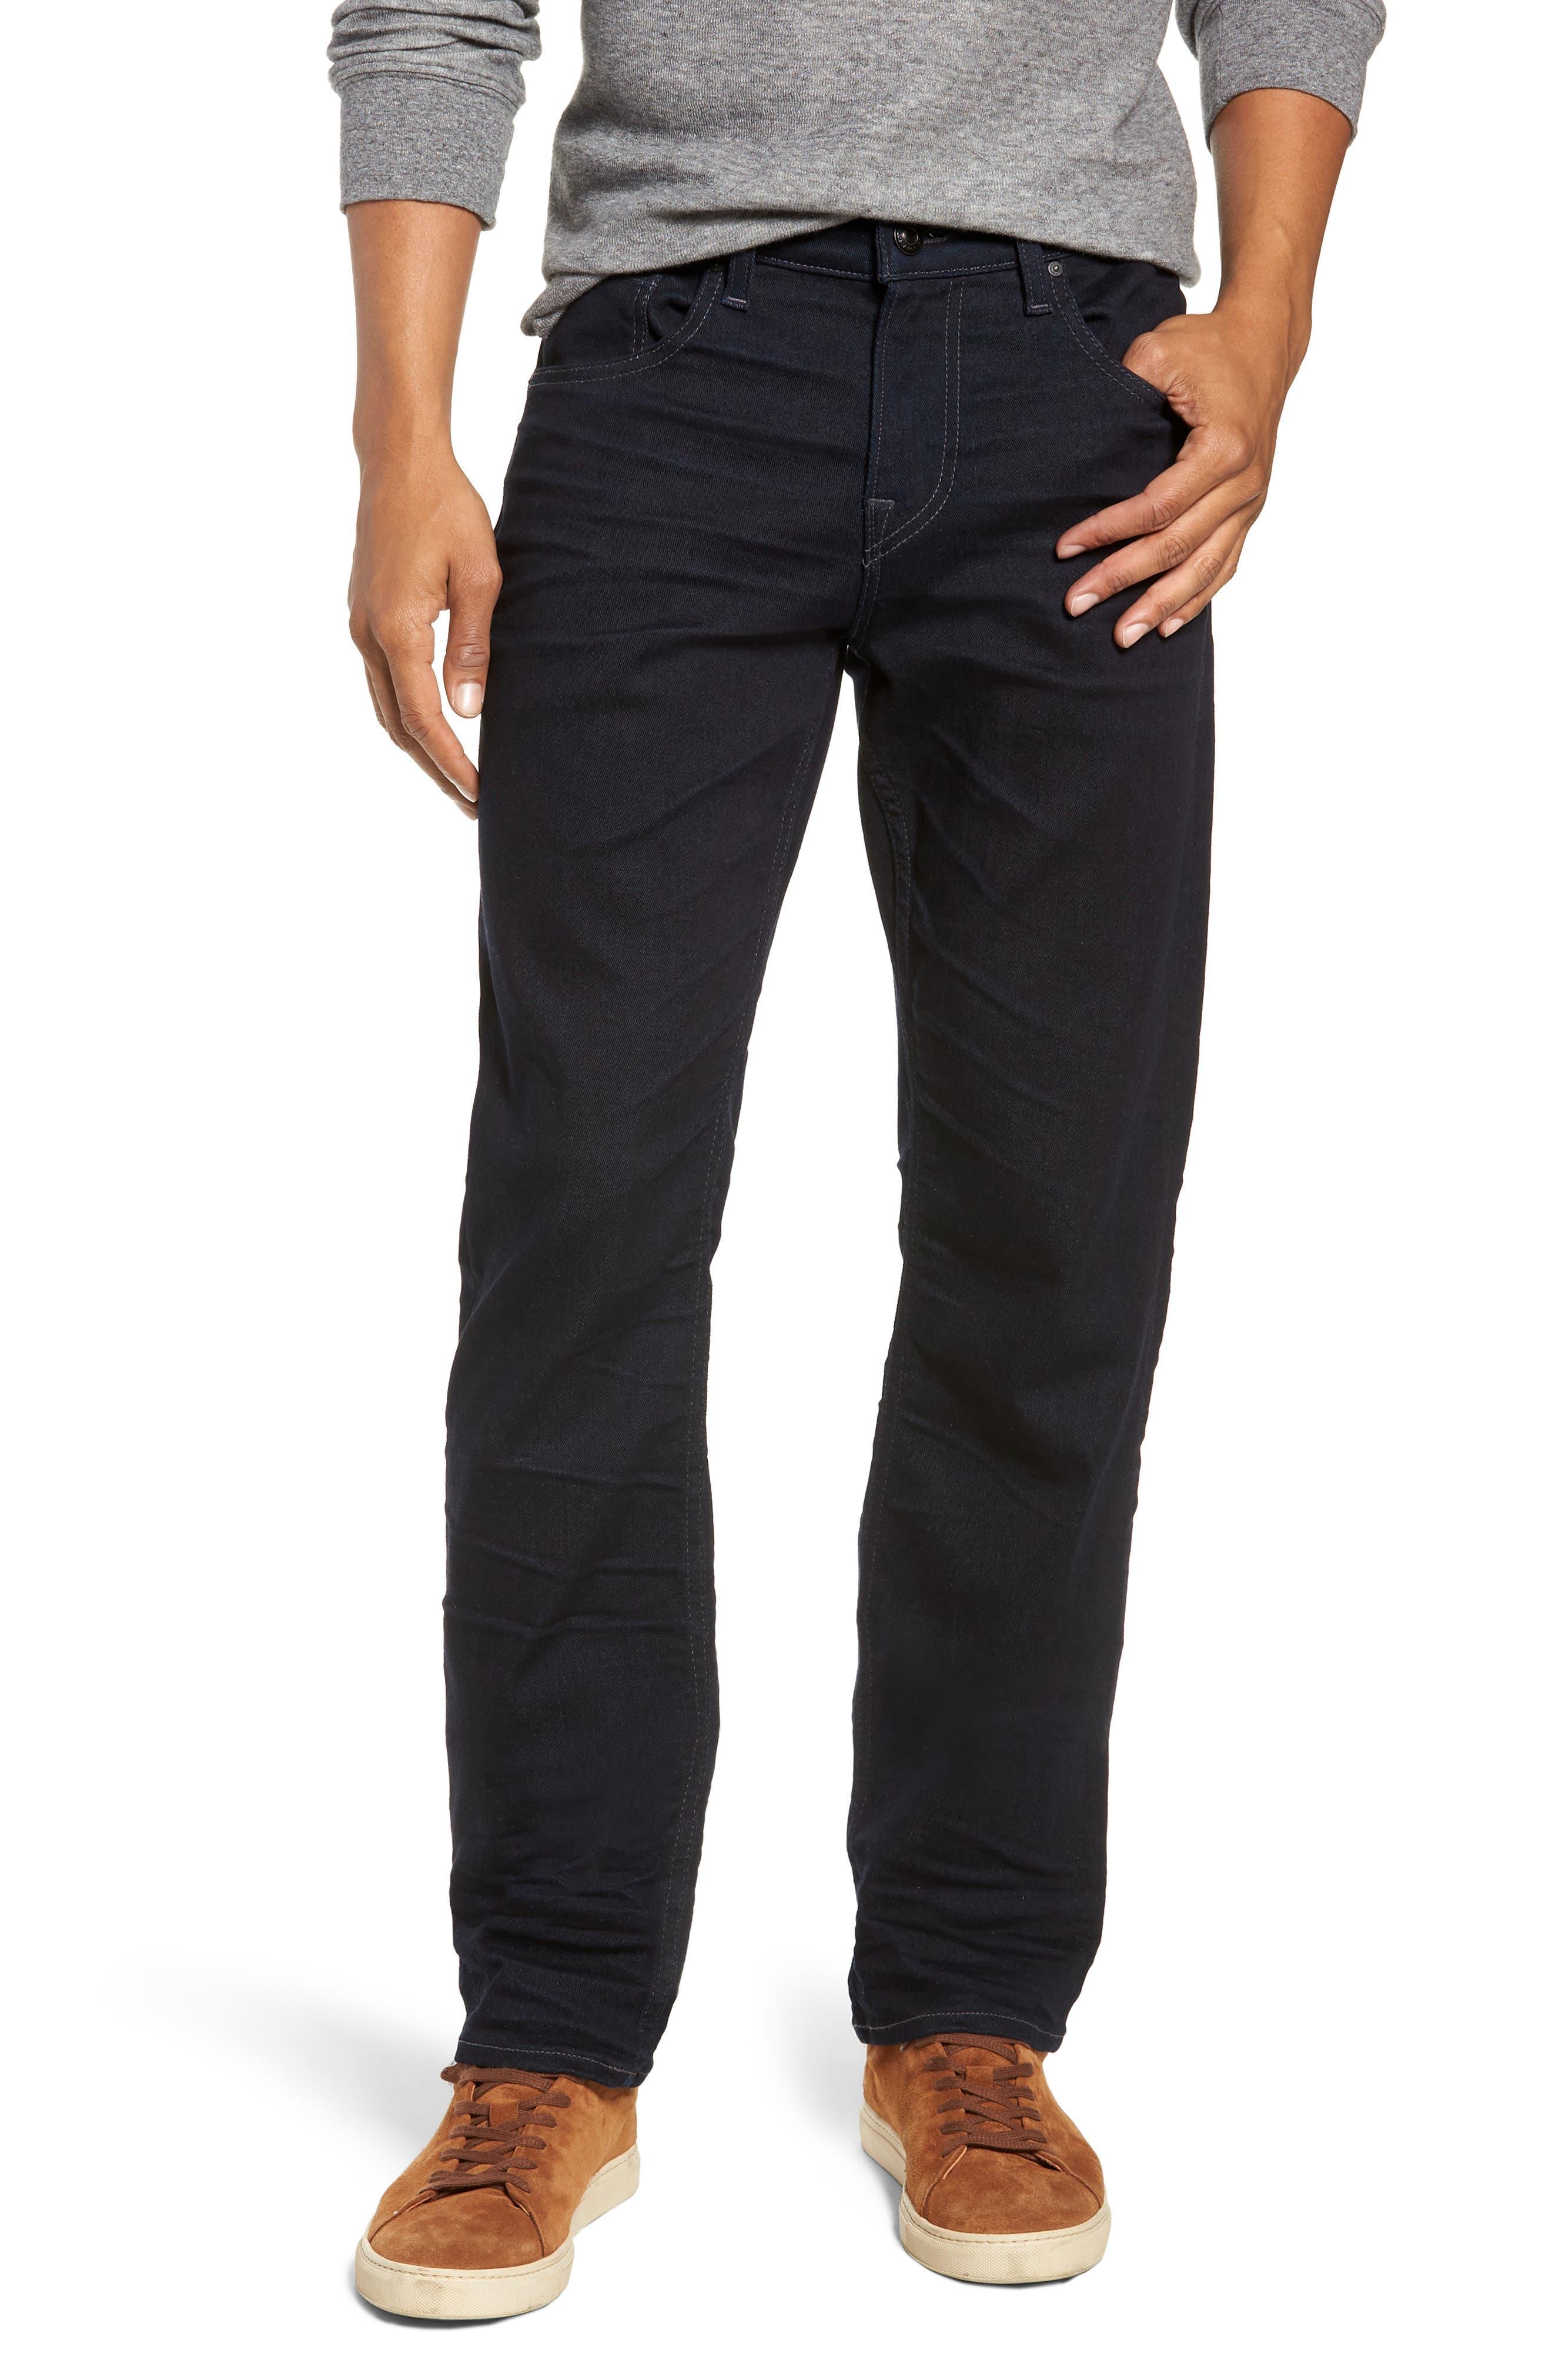 HUDSON JEANS, Byron Slim Straight Leg Jeans, Main thumbnail 1, color, TUDOR